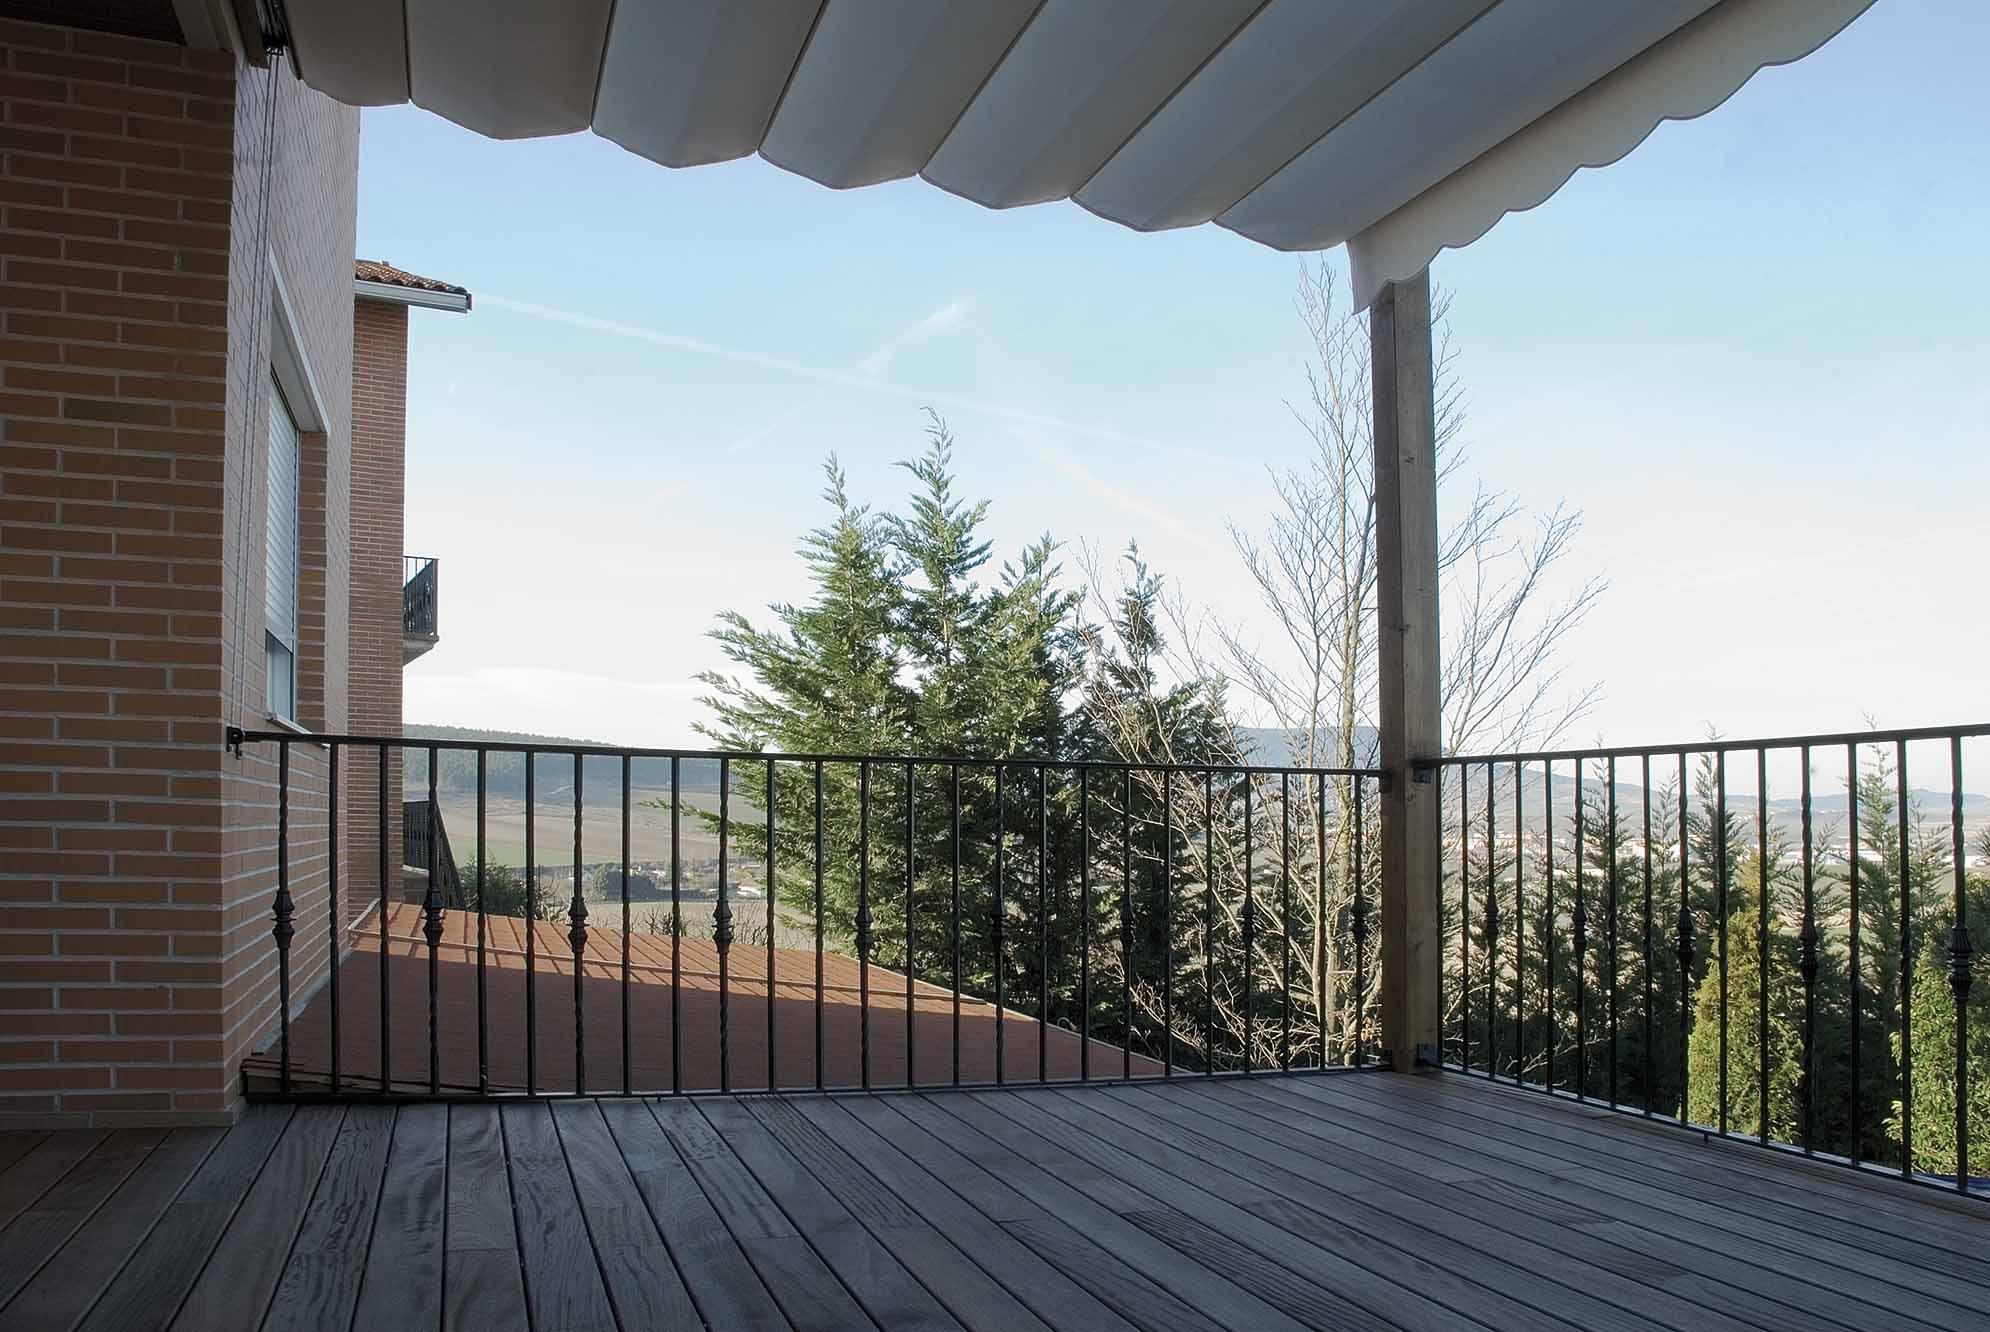 toldos-porche-jardin-exterior-8